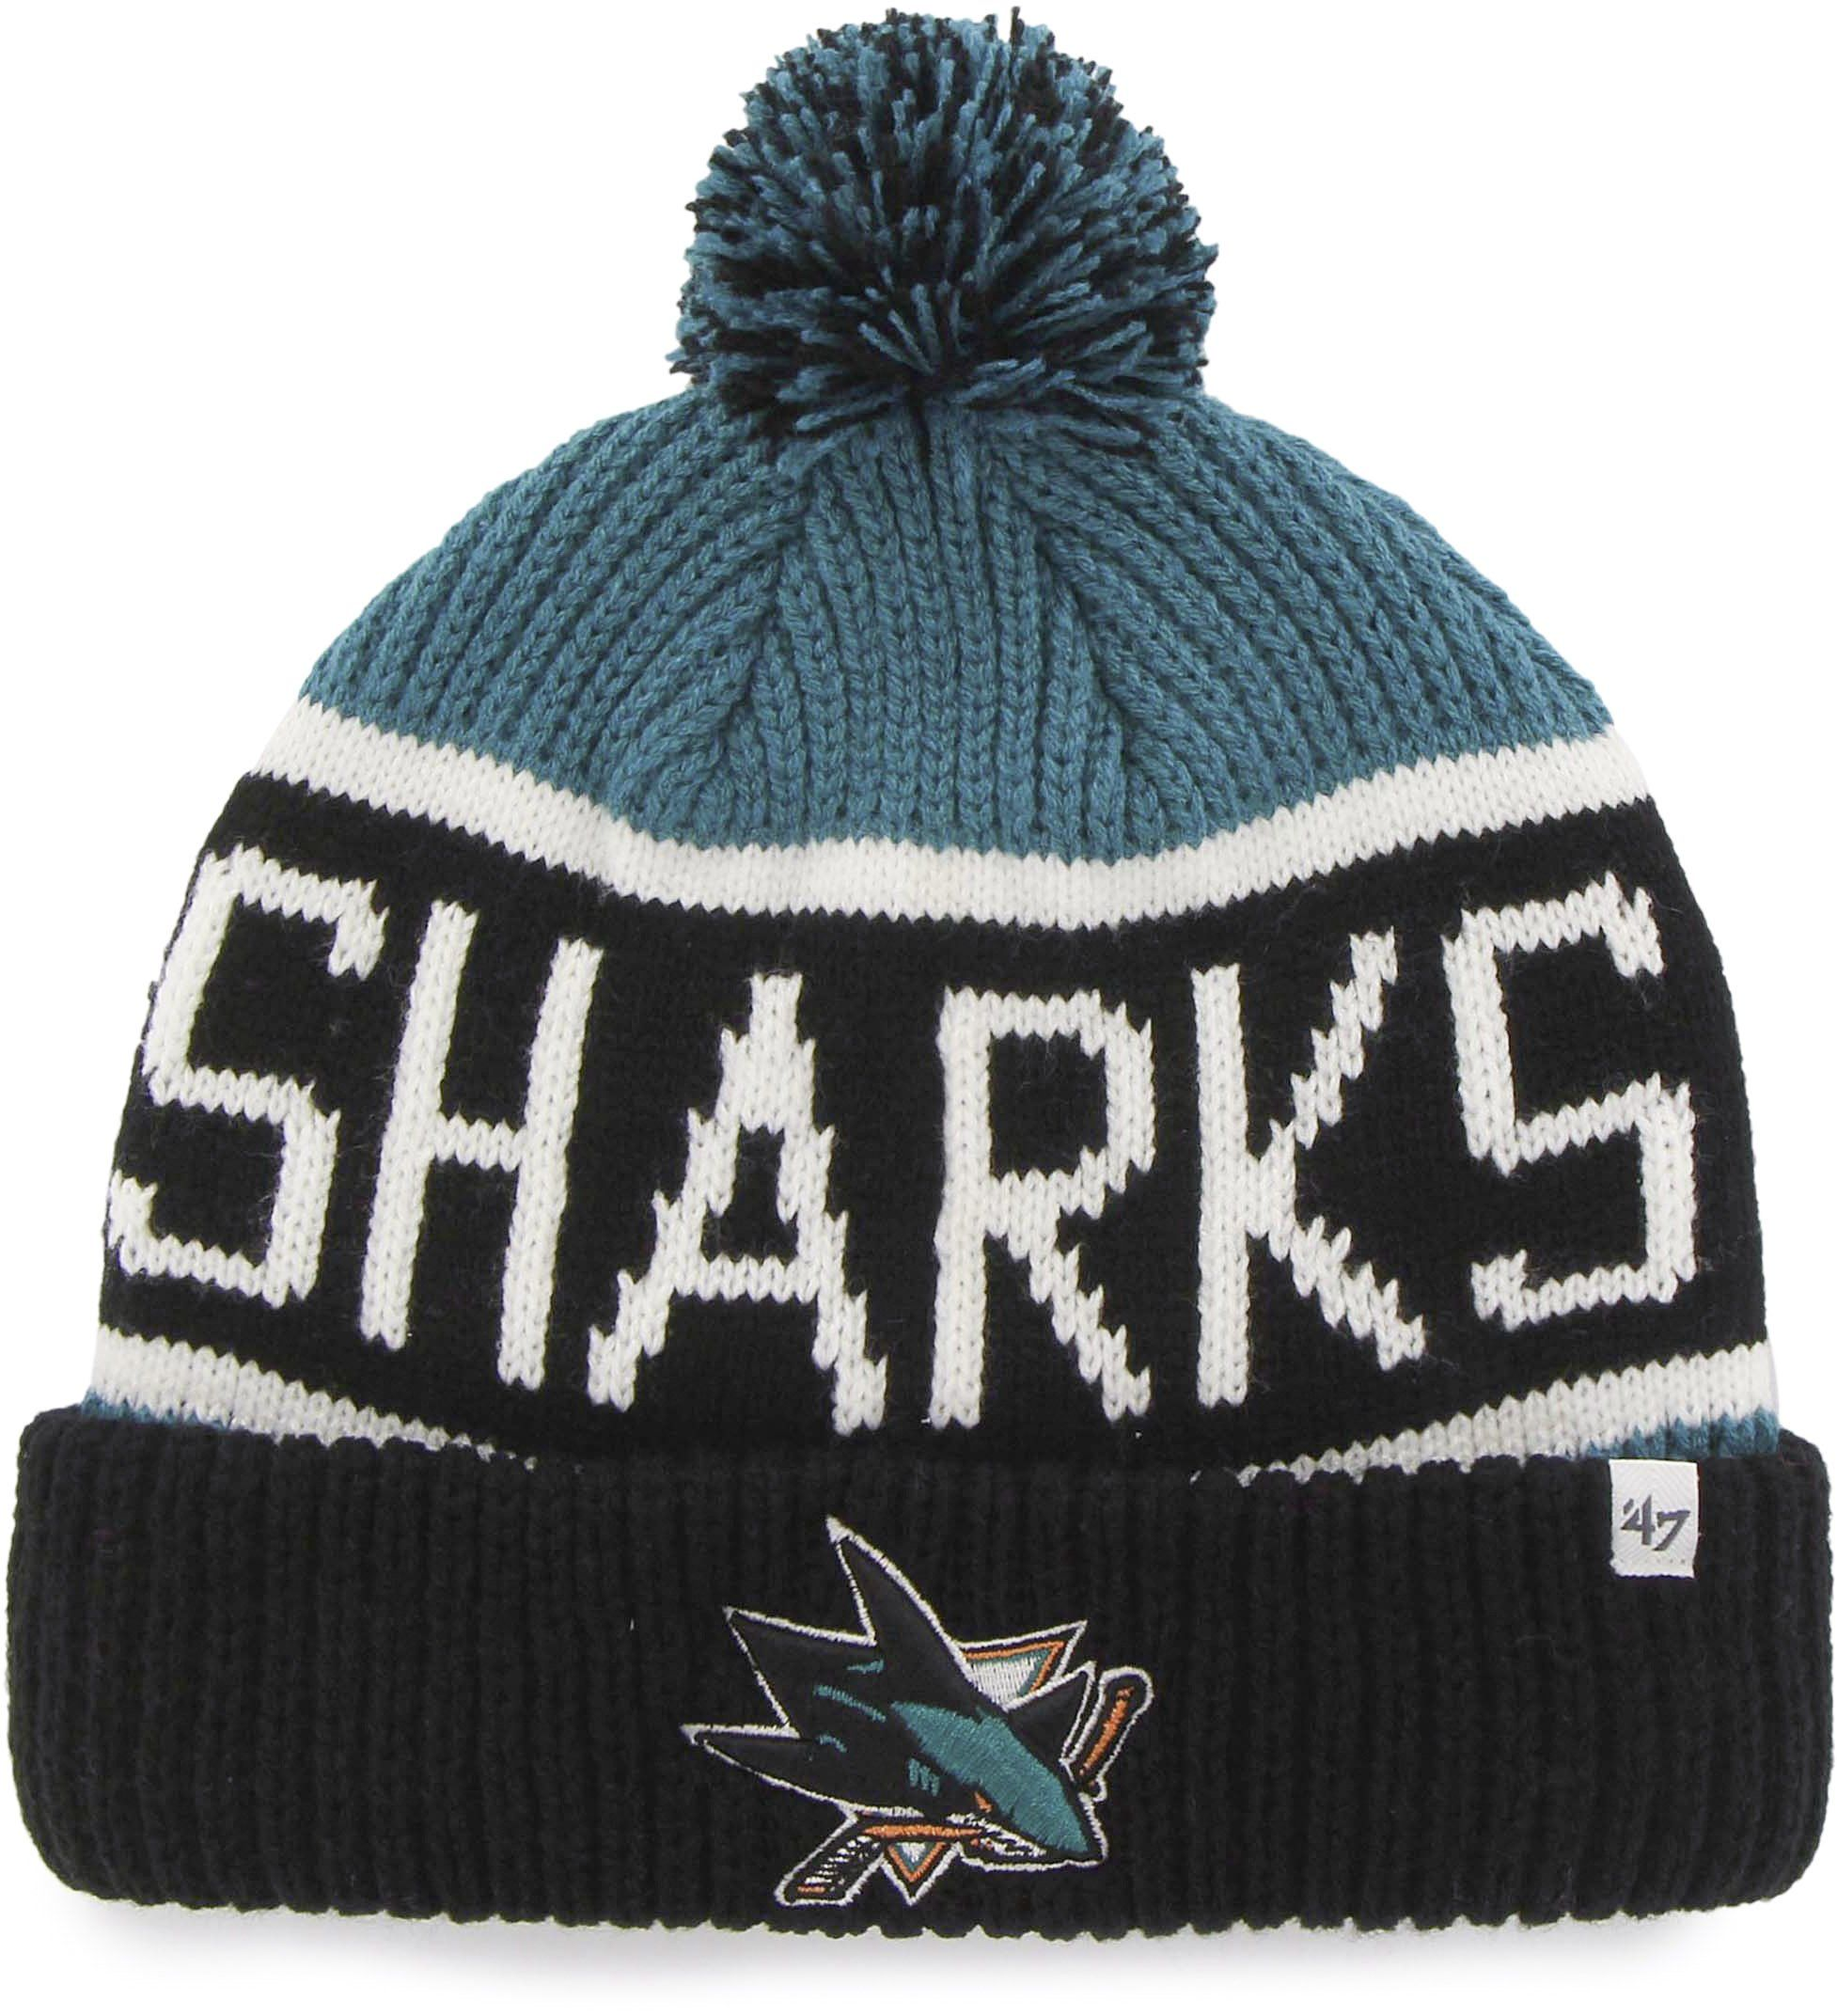 db564c6e3c2 San Jose Sharks 47 Brand Calgary Cuff Knit NHL Bobble Hat – lovemycap